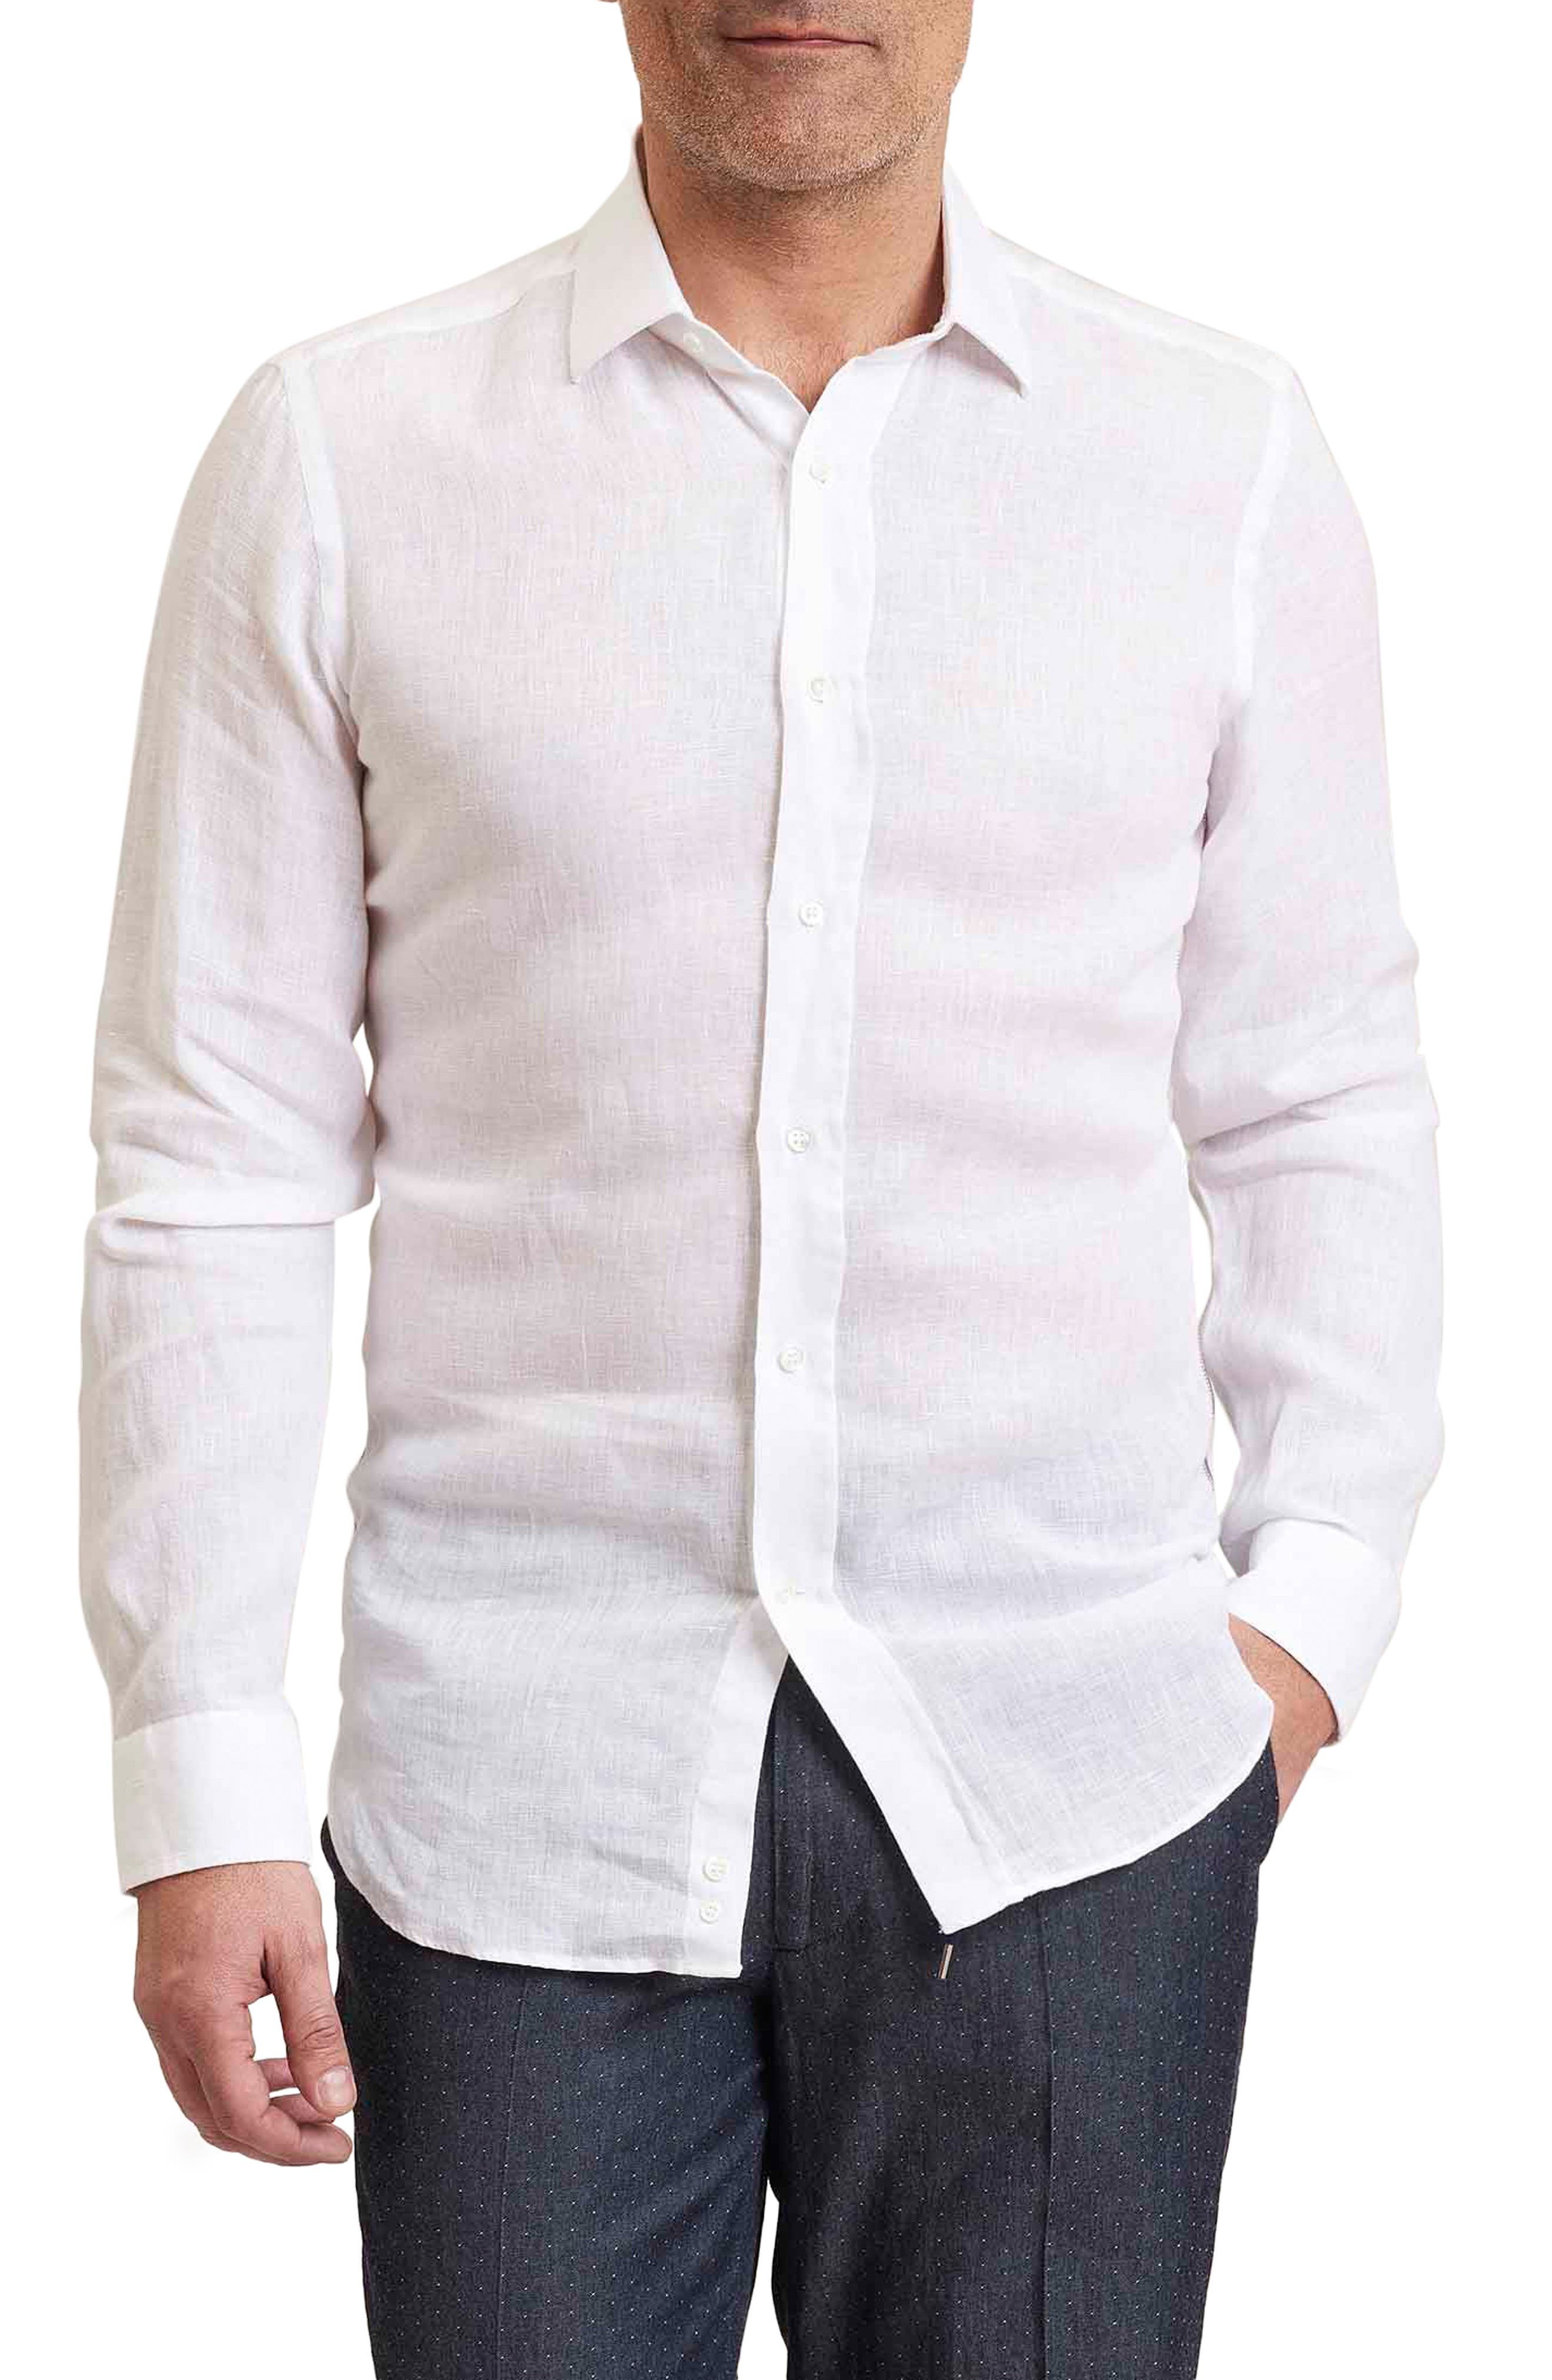 Delave Regular Fit Linen Sport Shirt,                             Main thumbnail 1, color,                             100